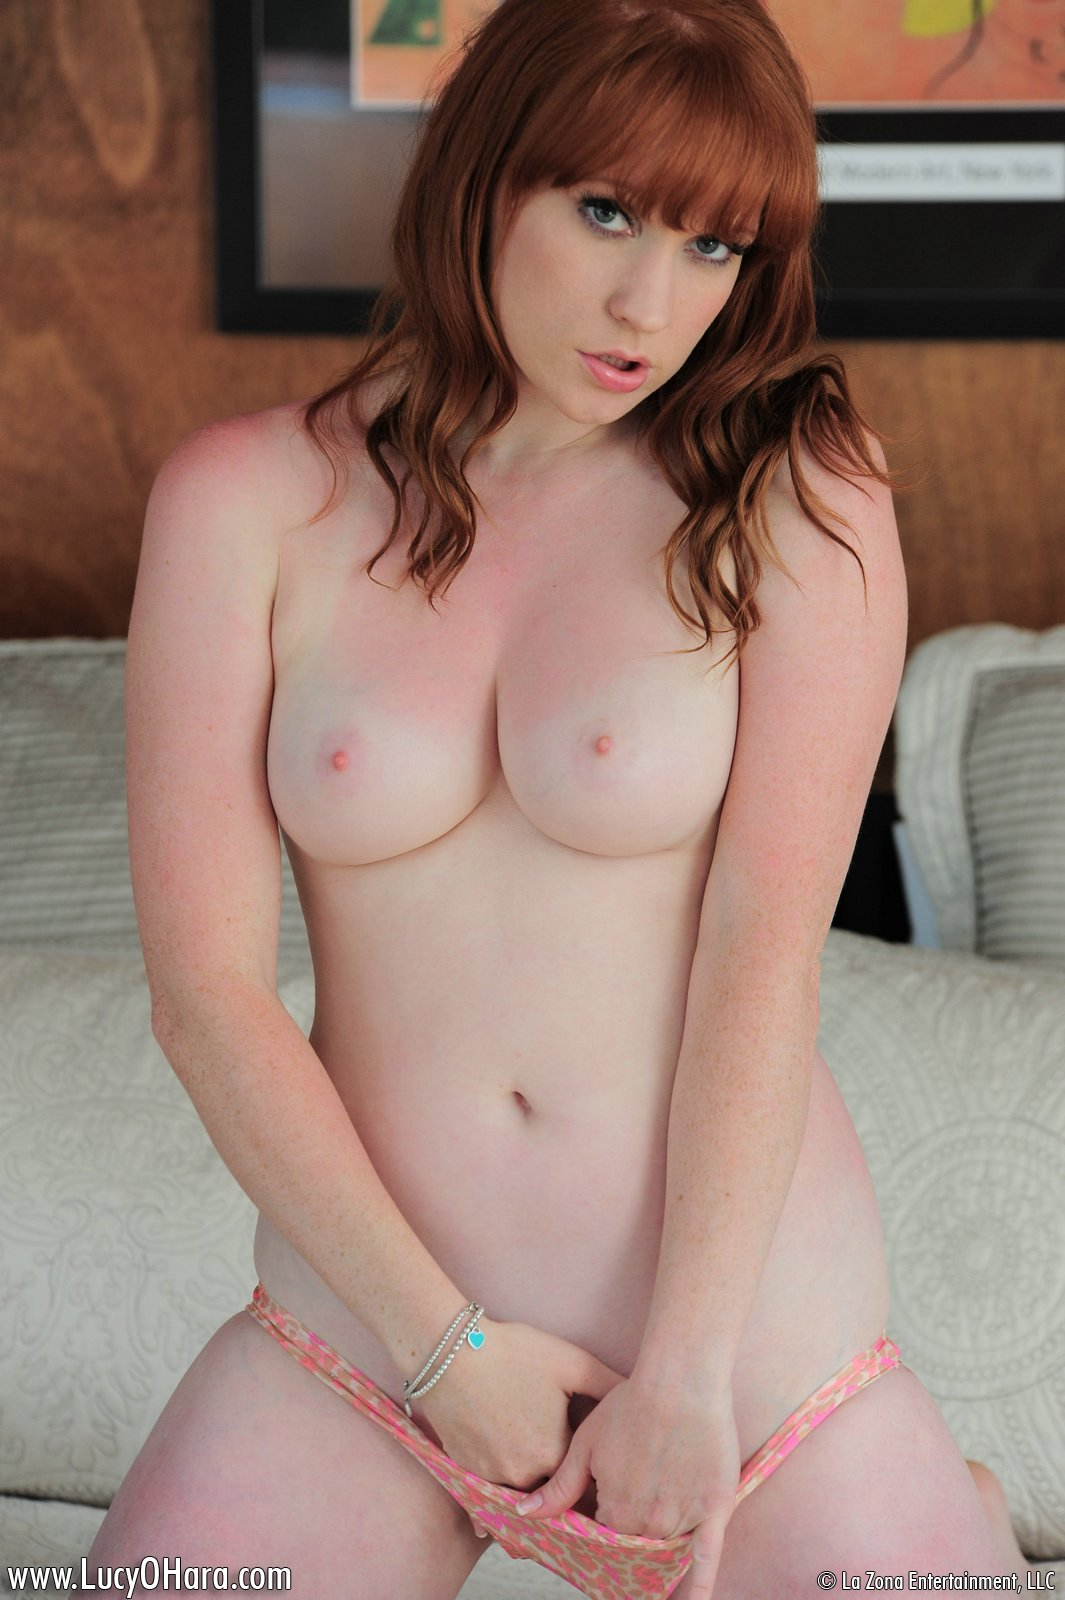 Sexy freckles redhead heather vs niagara - 2 10